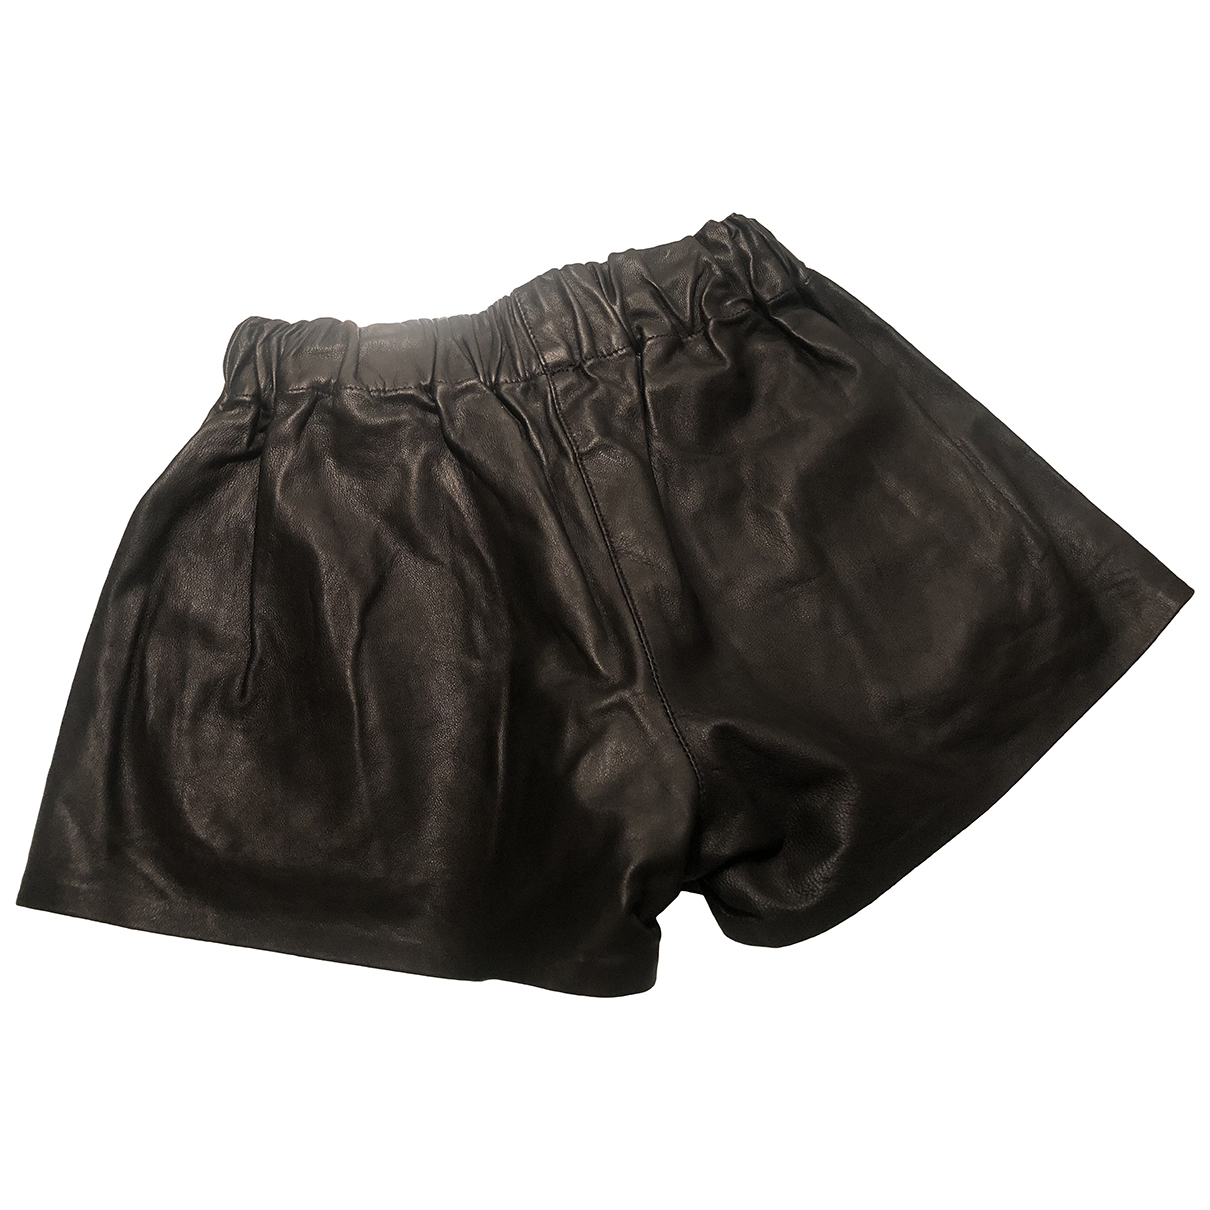 Rag & Bone \N Black Leather Shorts for Women S International